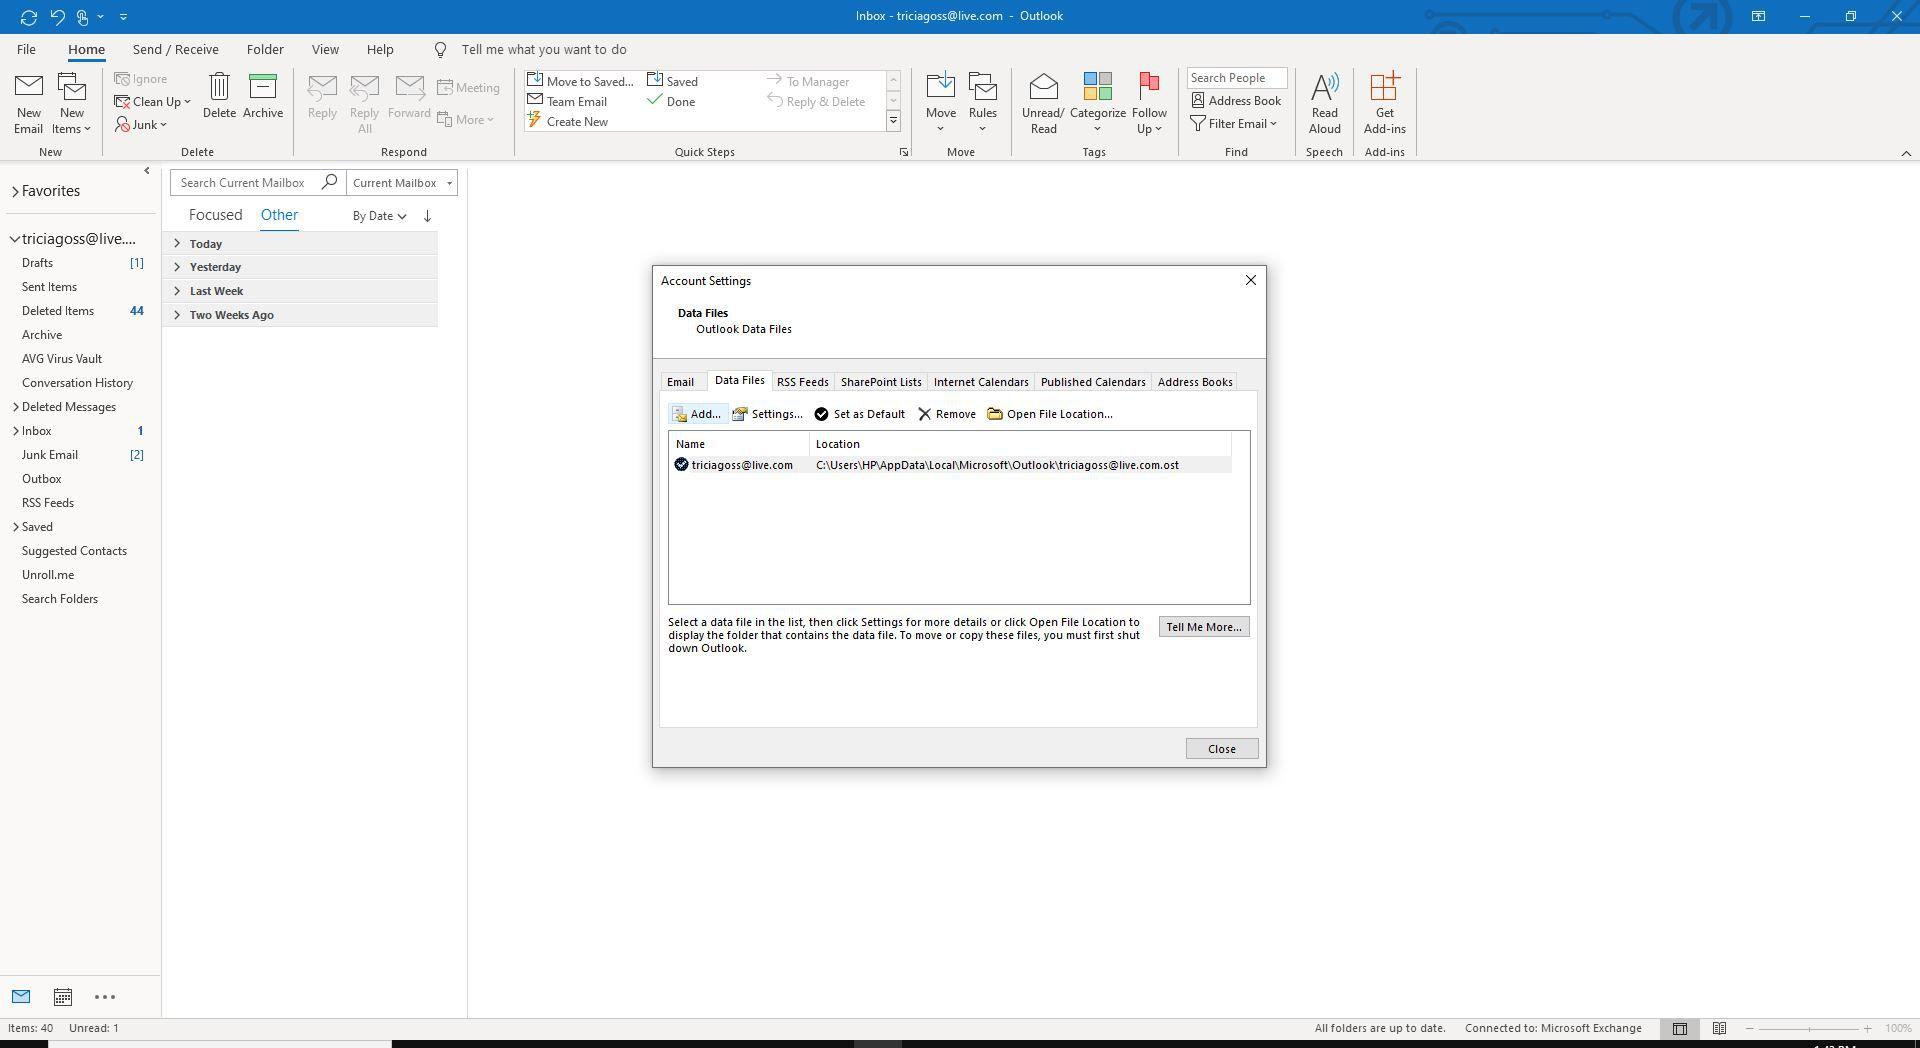 Screenshot of Add on Data Files tab